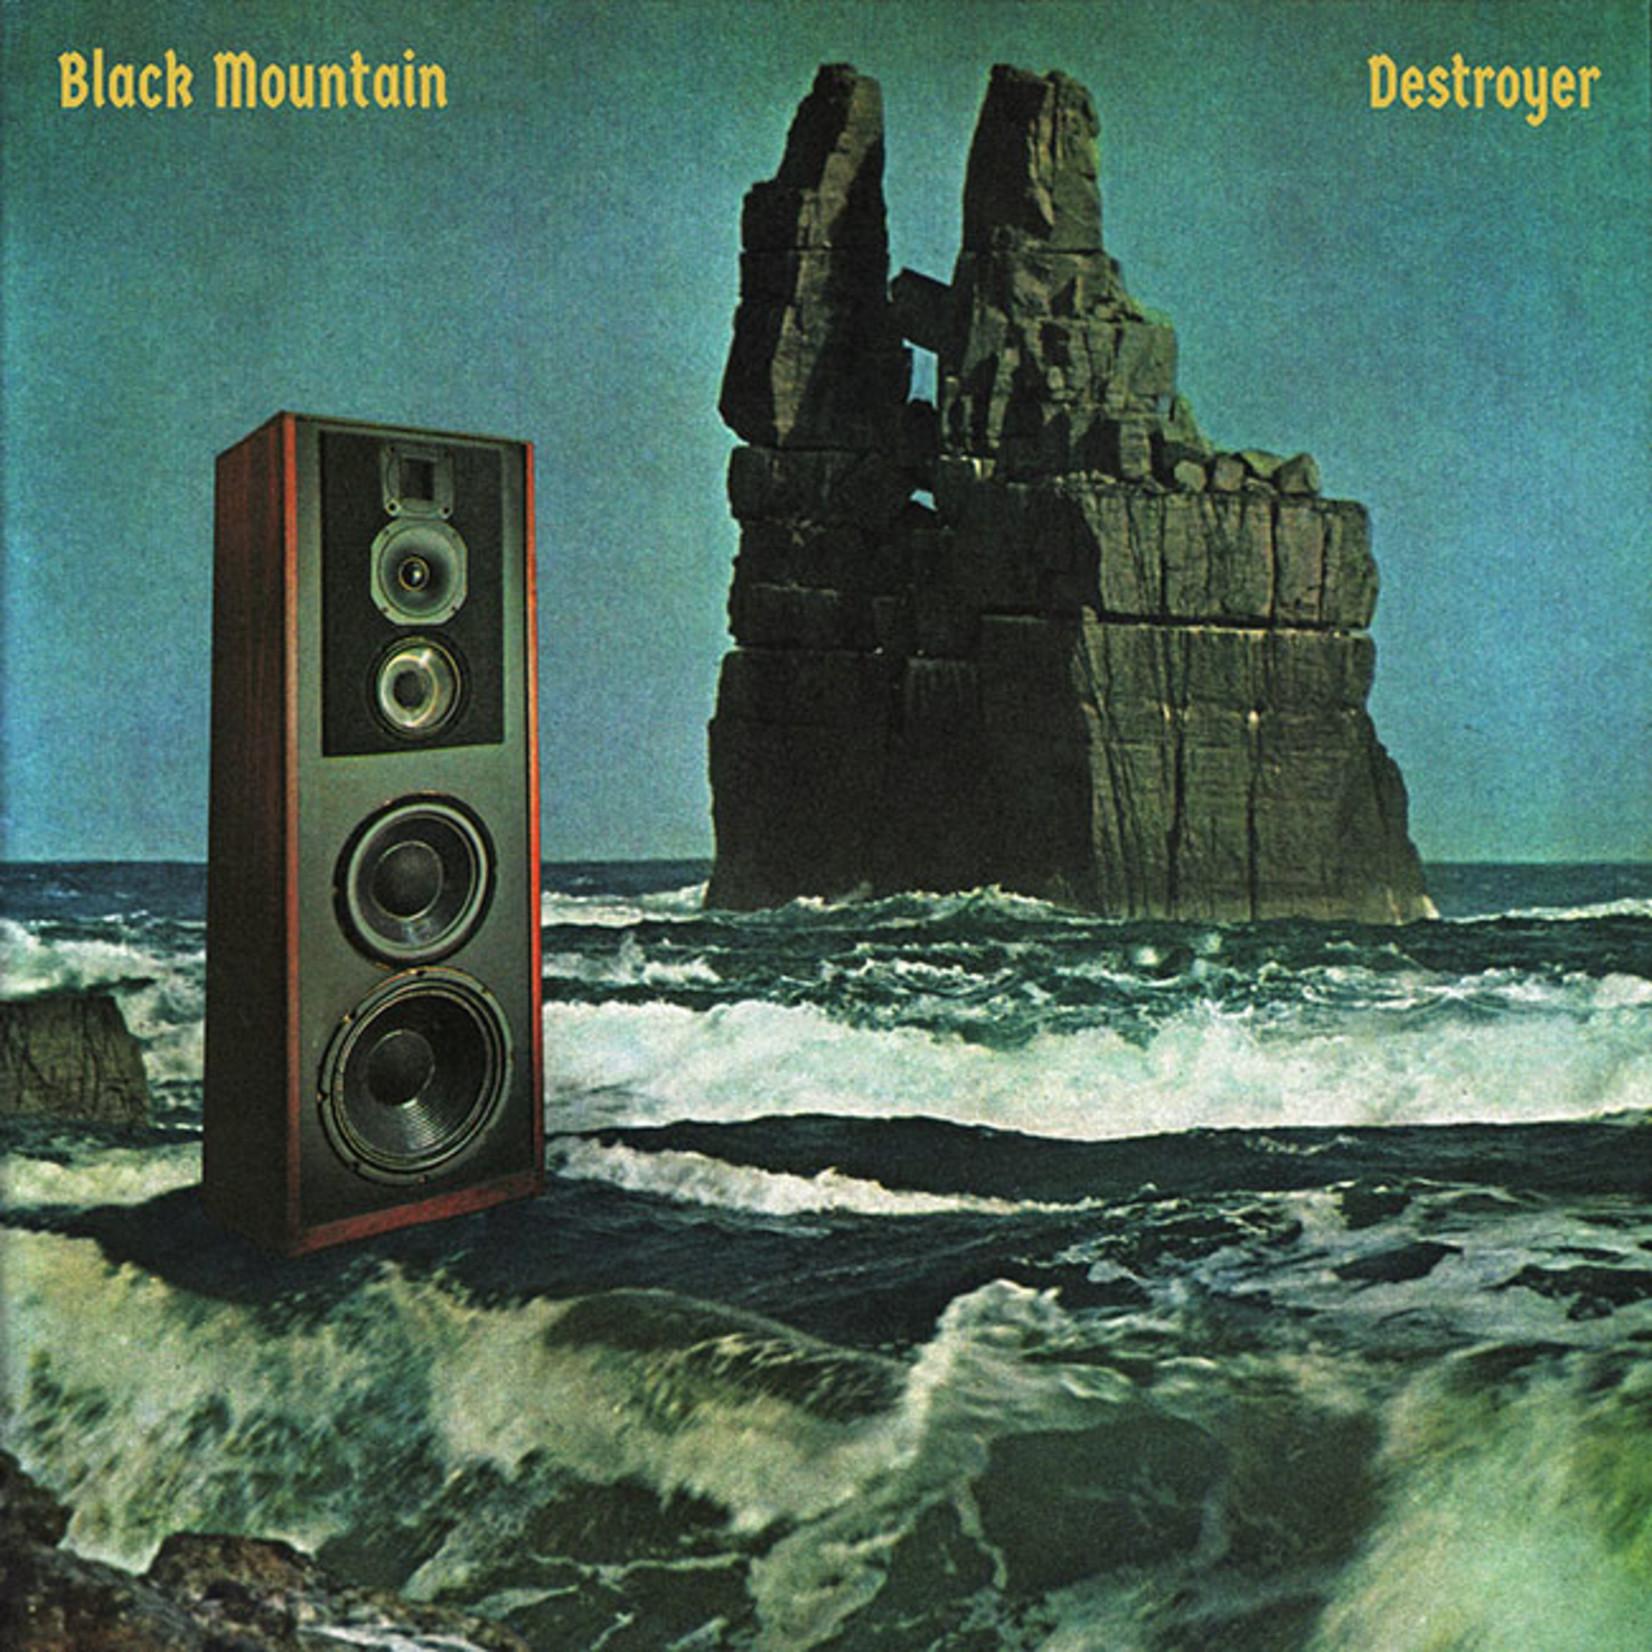 [New] Black Mountain: Destroyer